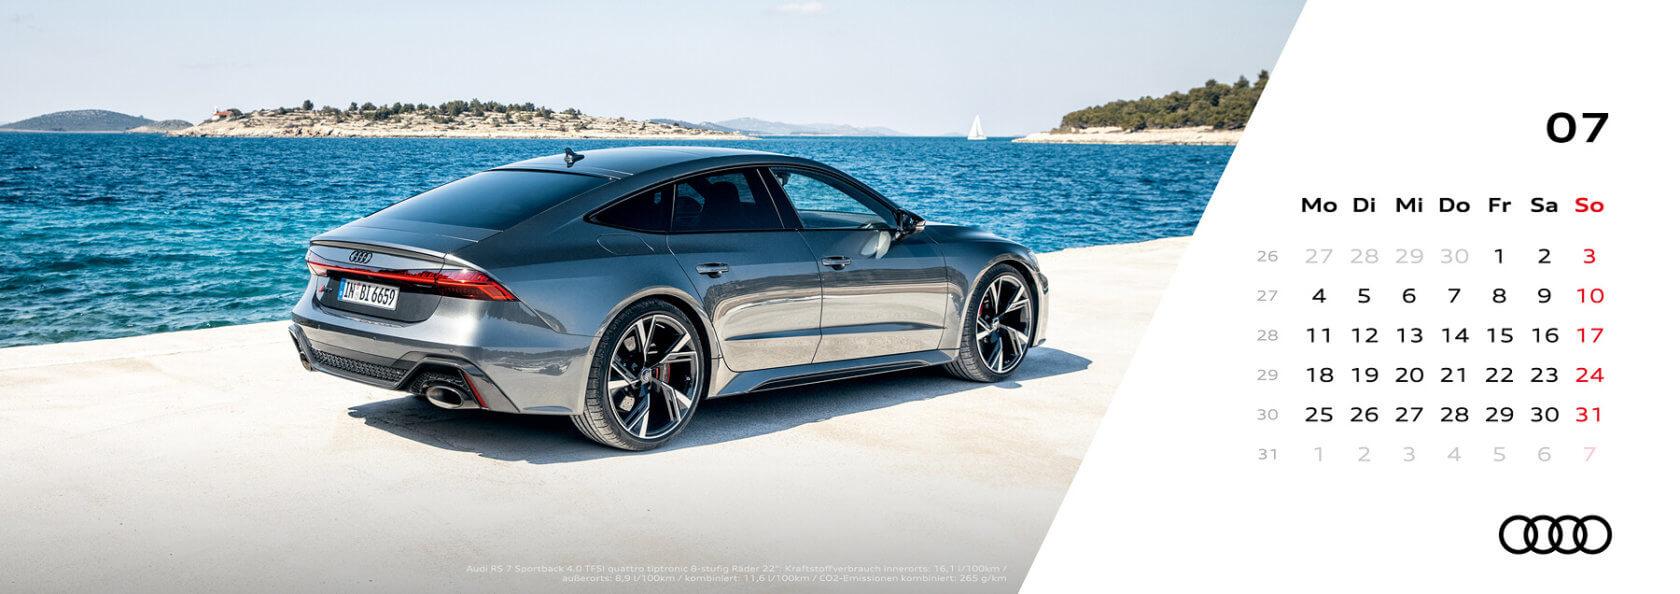 Audi Tischkalender 2022 - Juli